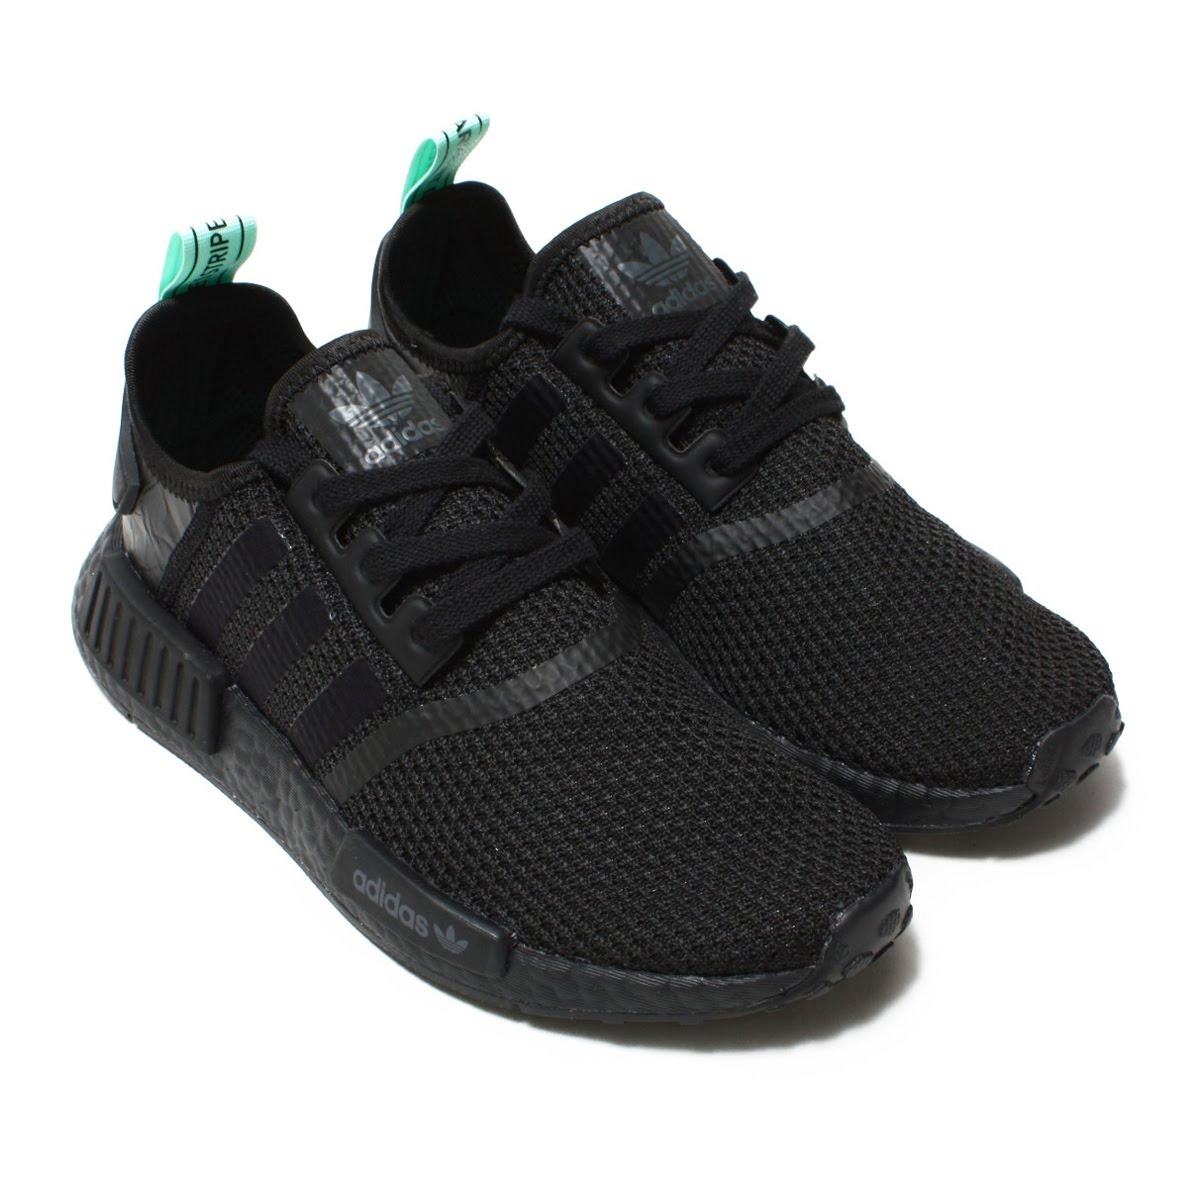 adidas Originals NMD R1 W (Adidas originals N M D R1 W) Core Black Core  Black Clear Mint 18FW-I 18f9f166b